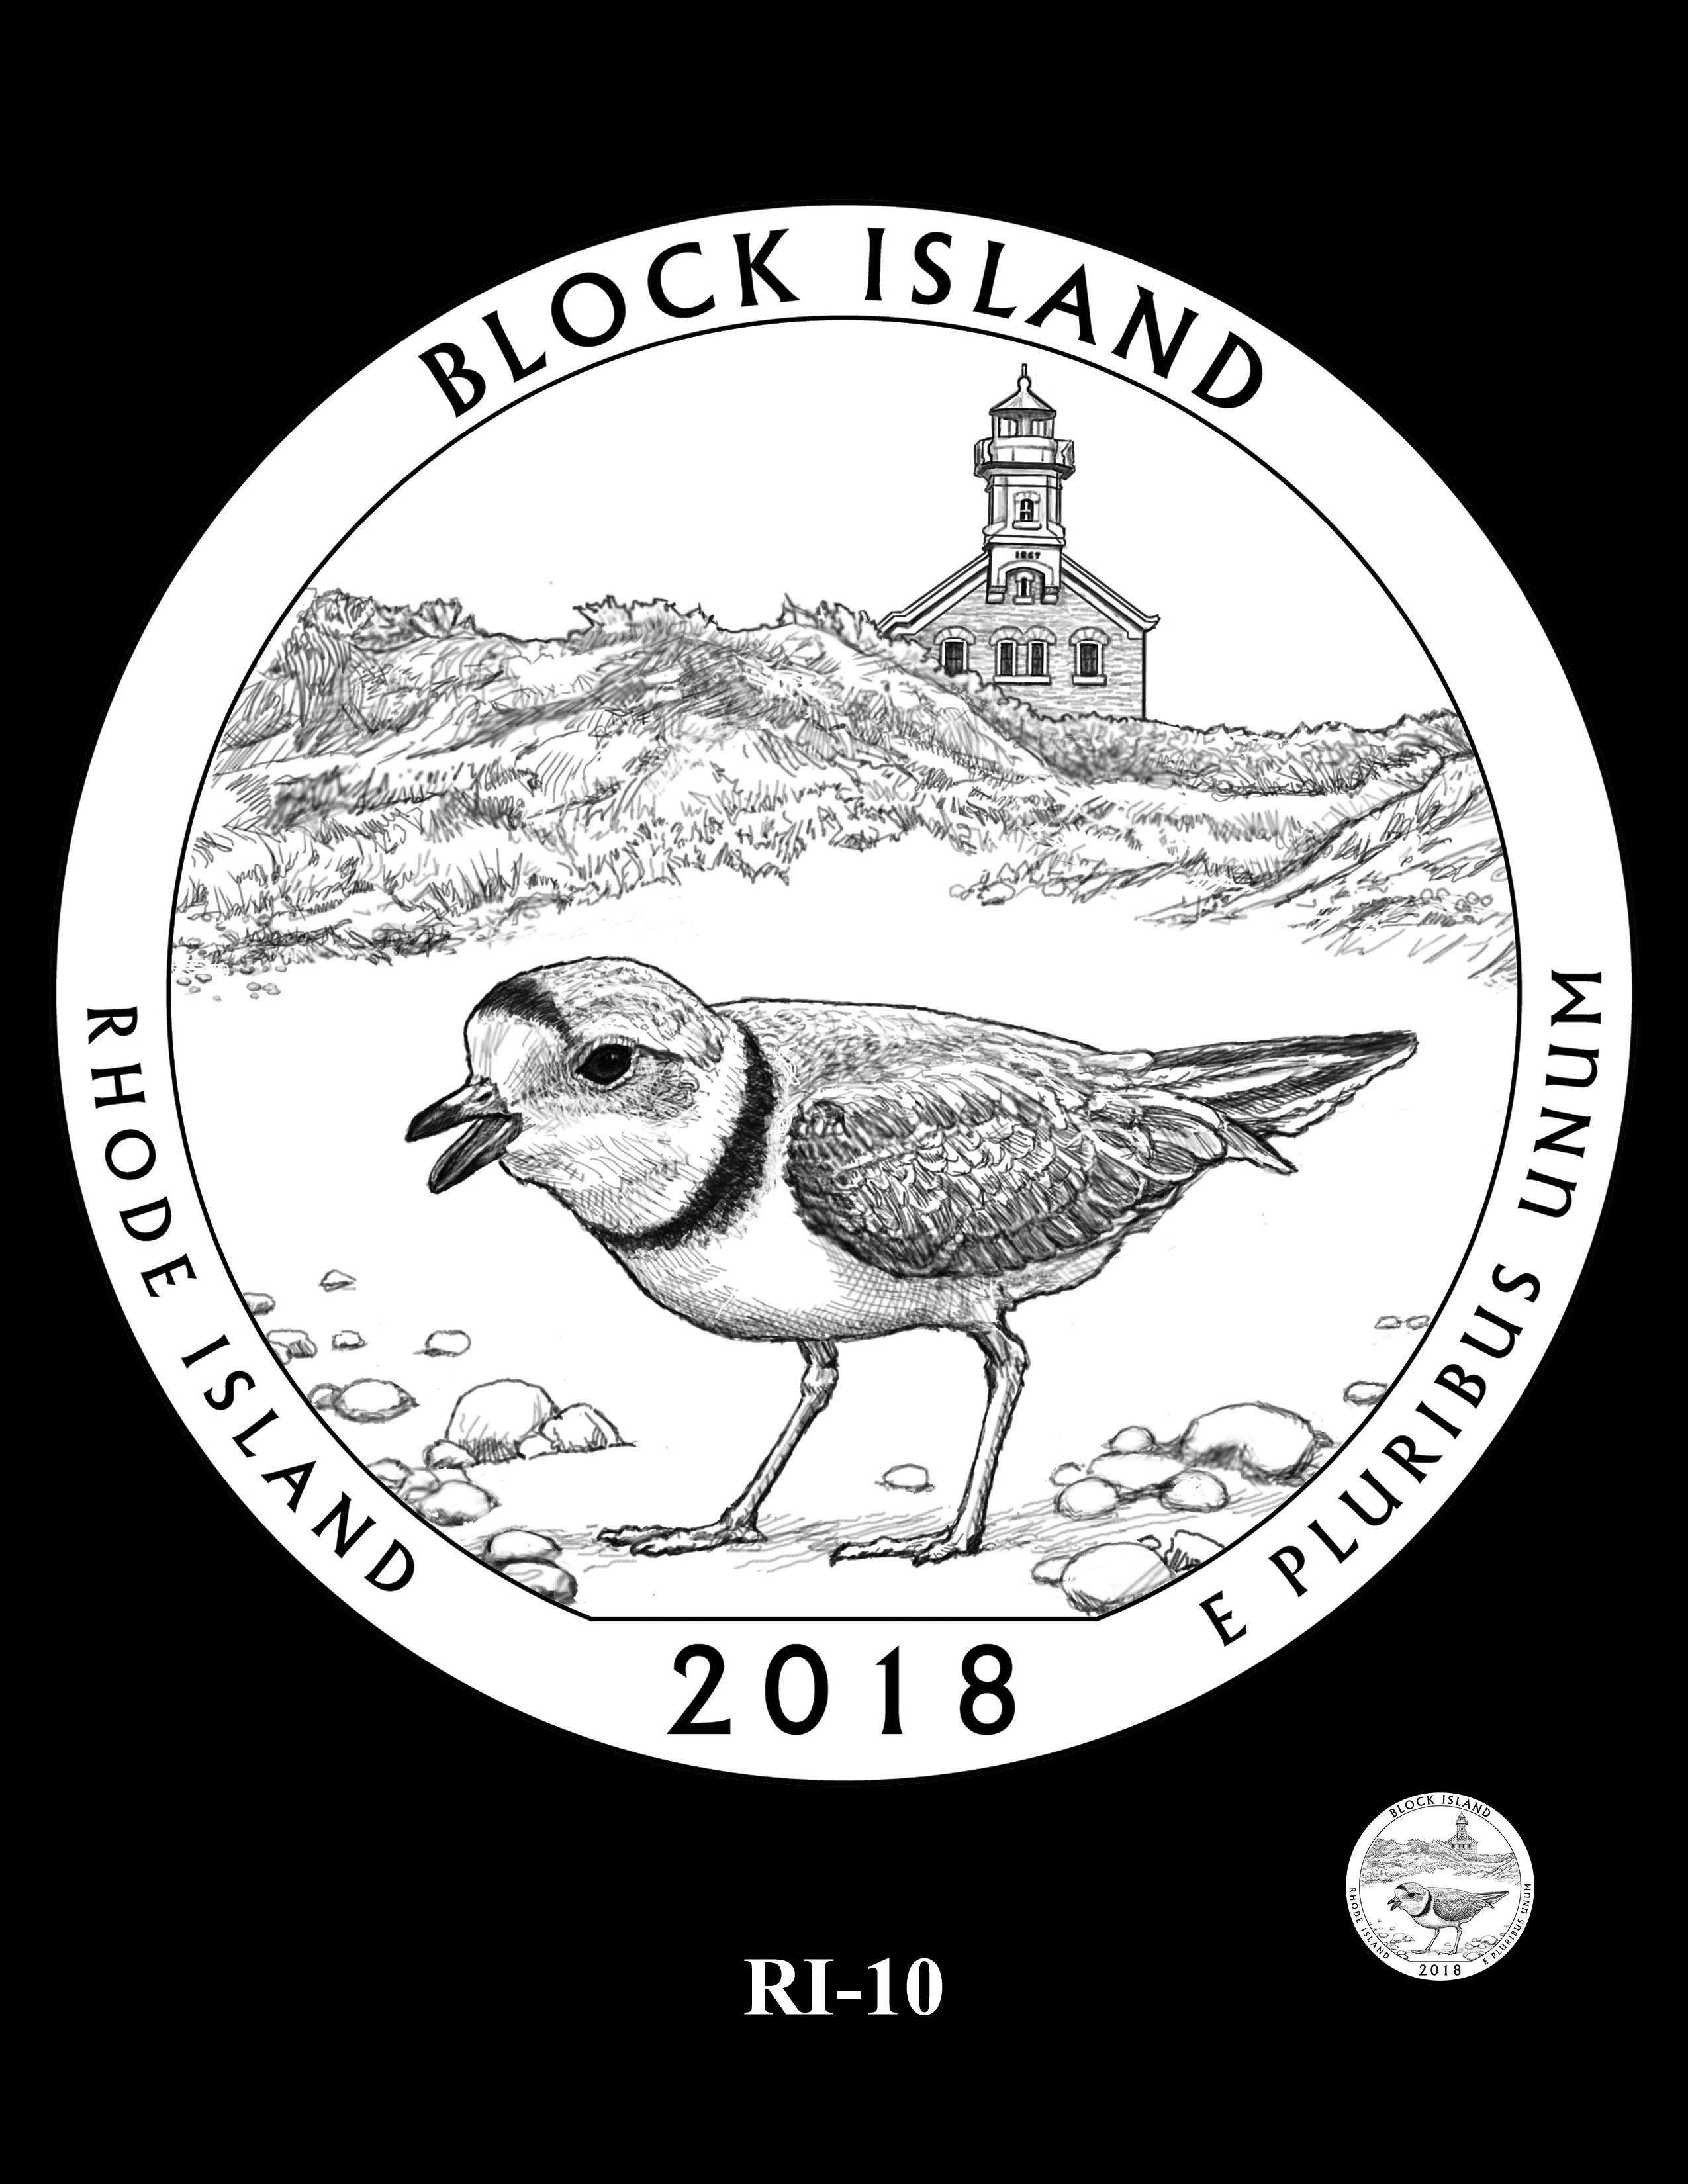 RI-10 -- 2018 America the Beautiful® Quarters Program